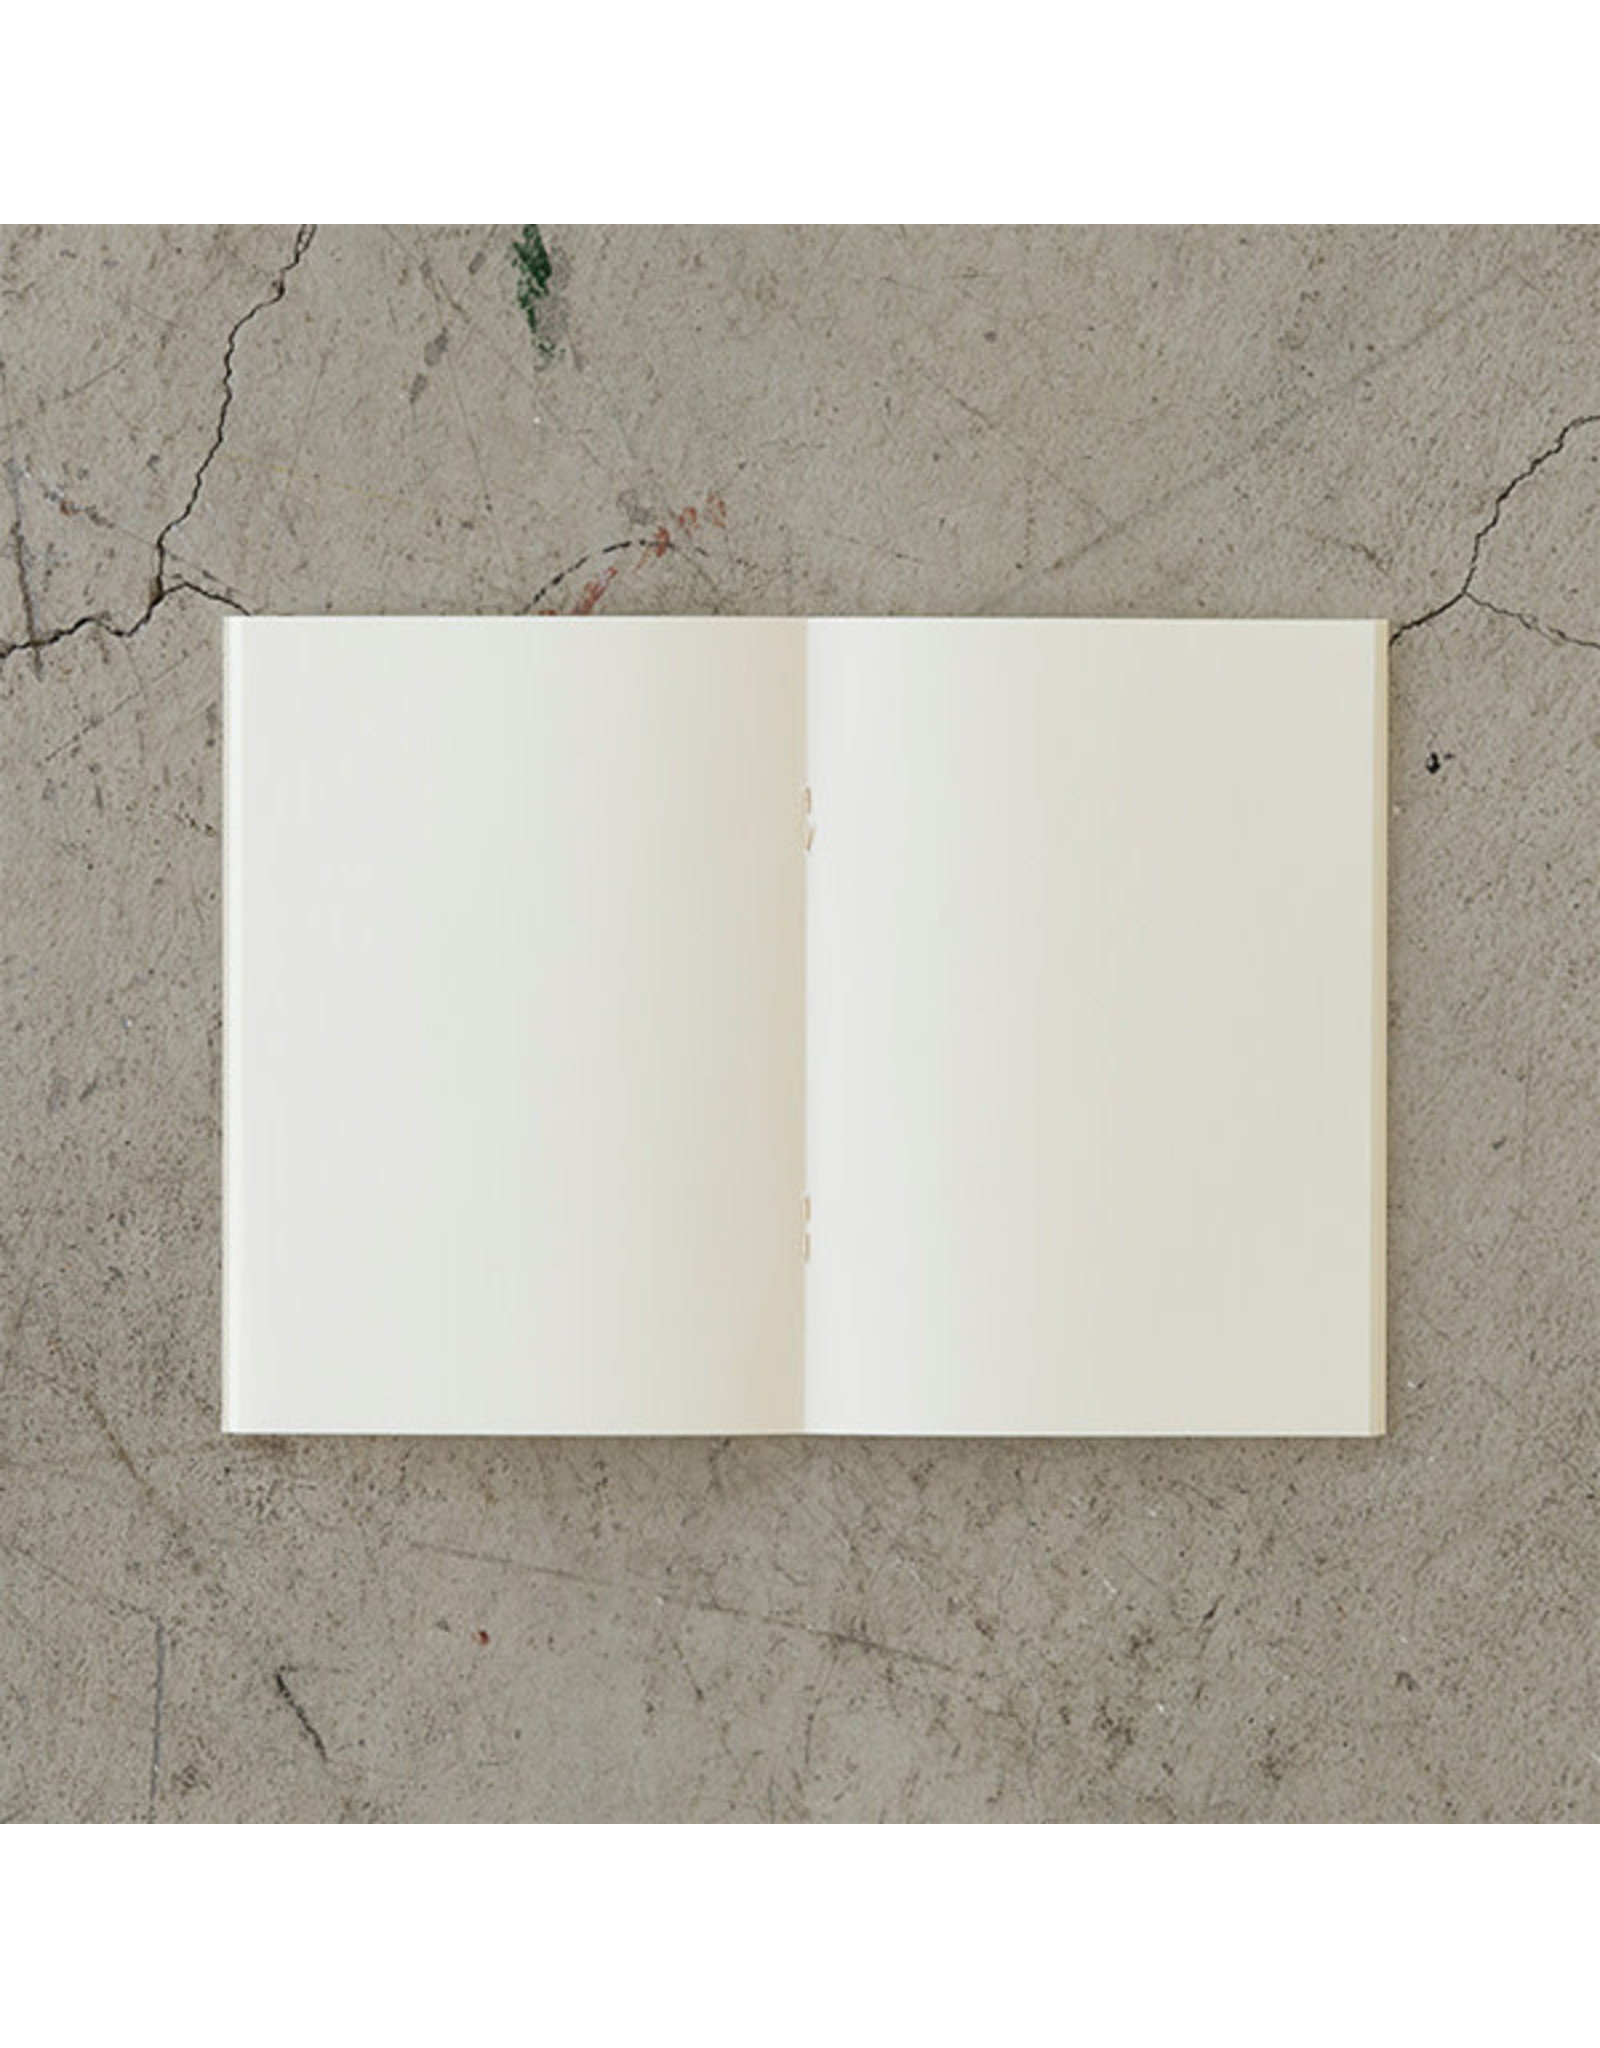 Designphil Inc. MD NOTEBOOK LIGHT BUNKO SIZE BLANK 3PCS PACK